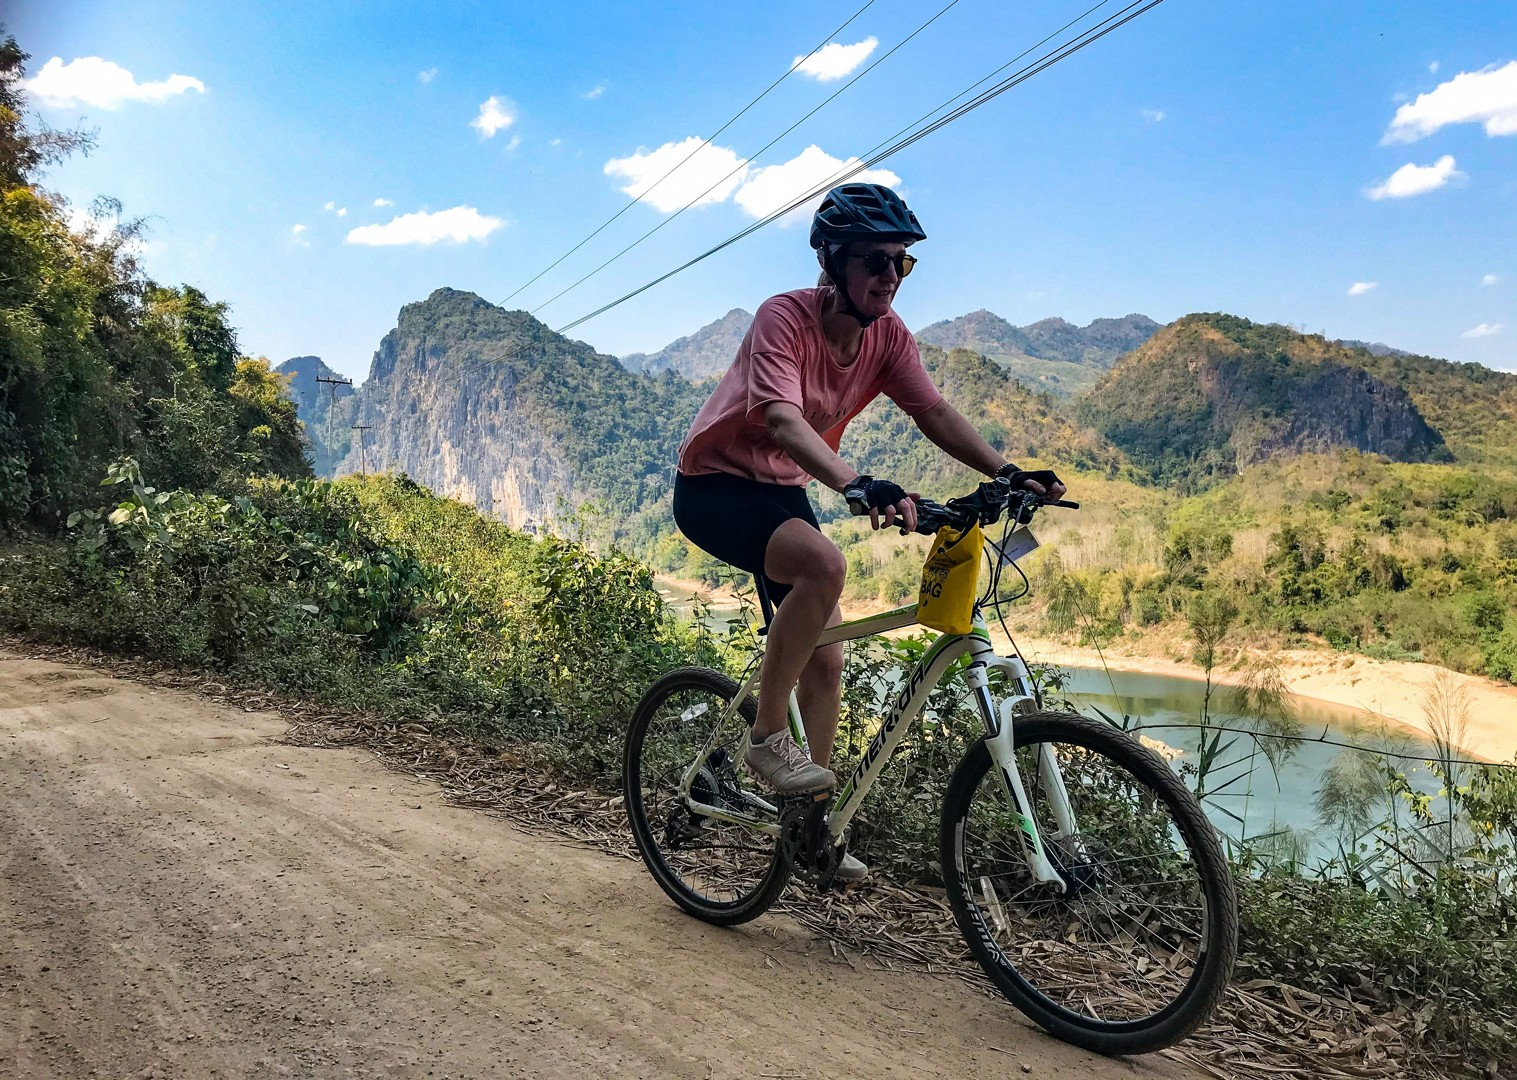 IMG_5209.jpg - Laos - Hidden Treasures - Cycling Adventures